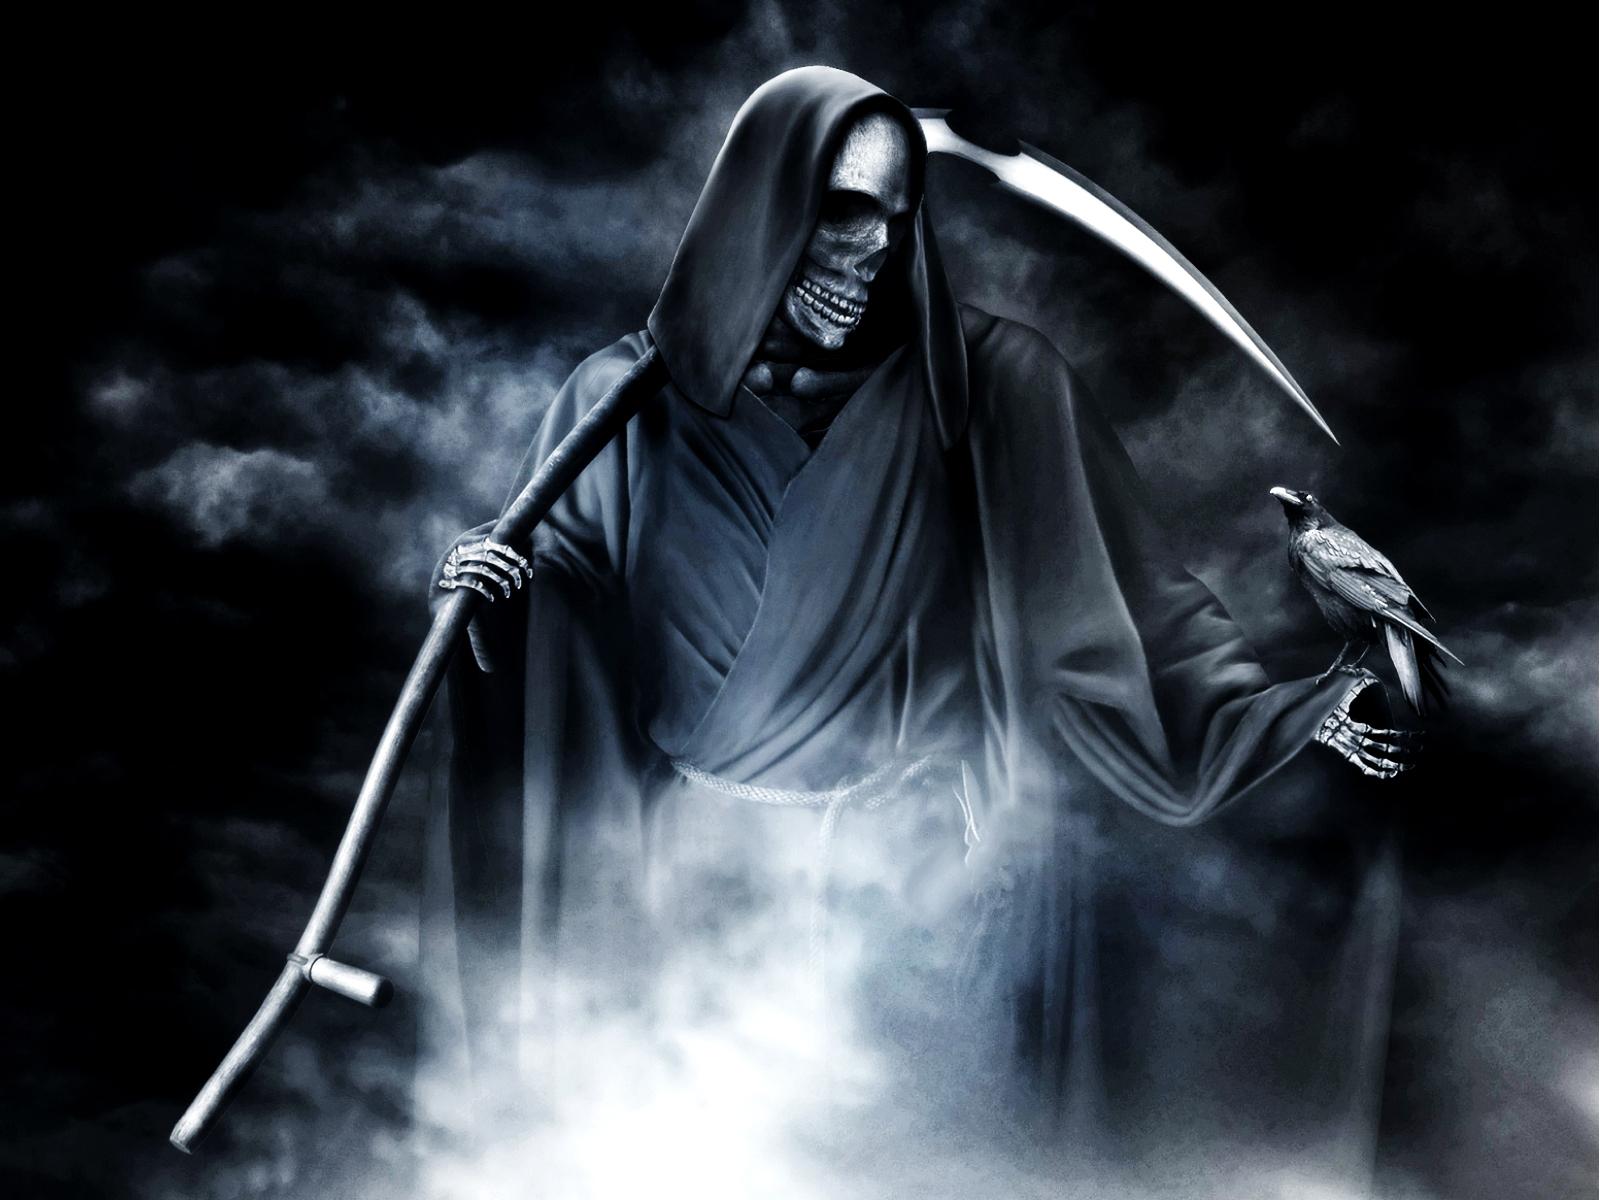 Bboy Wallpaper Full Hd Grim Reaper Hd Wallpapers Hd Wallpapers Backgrounds